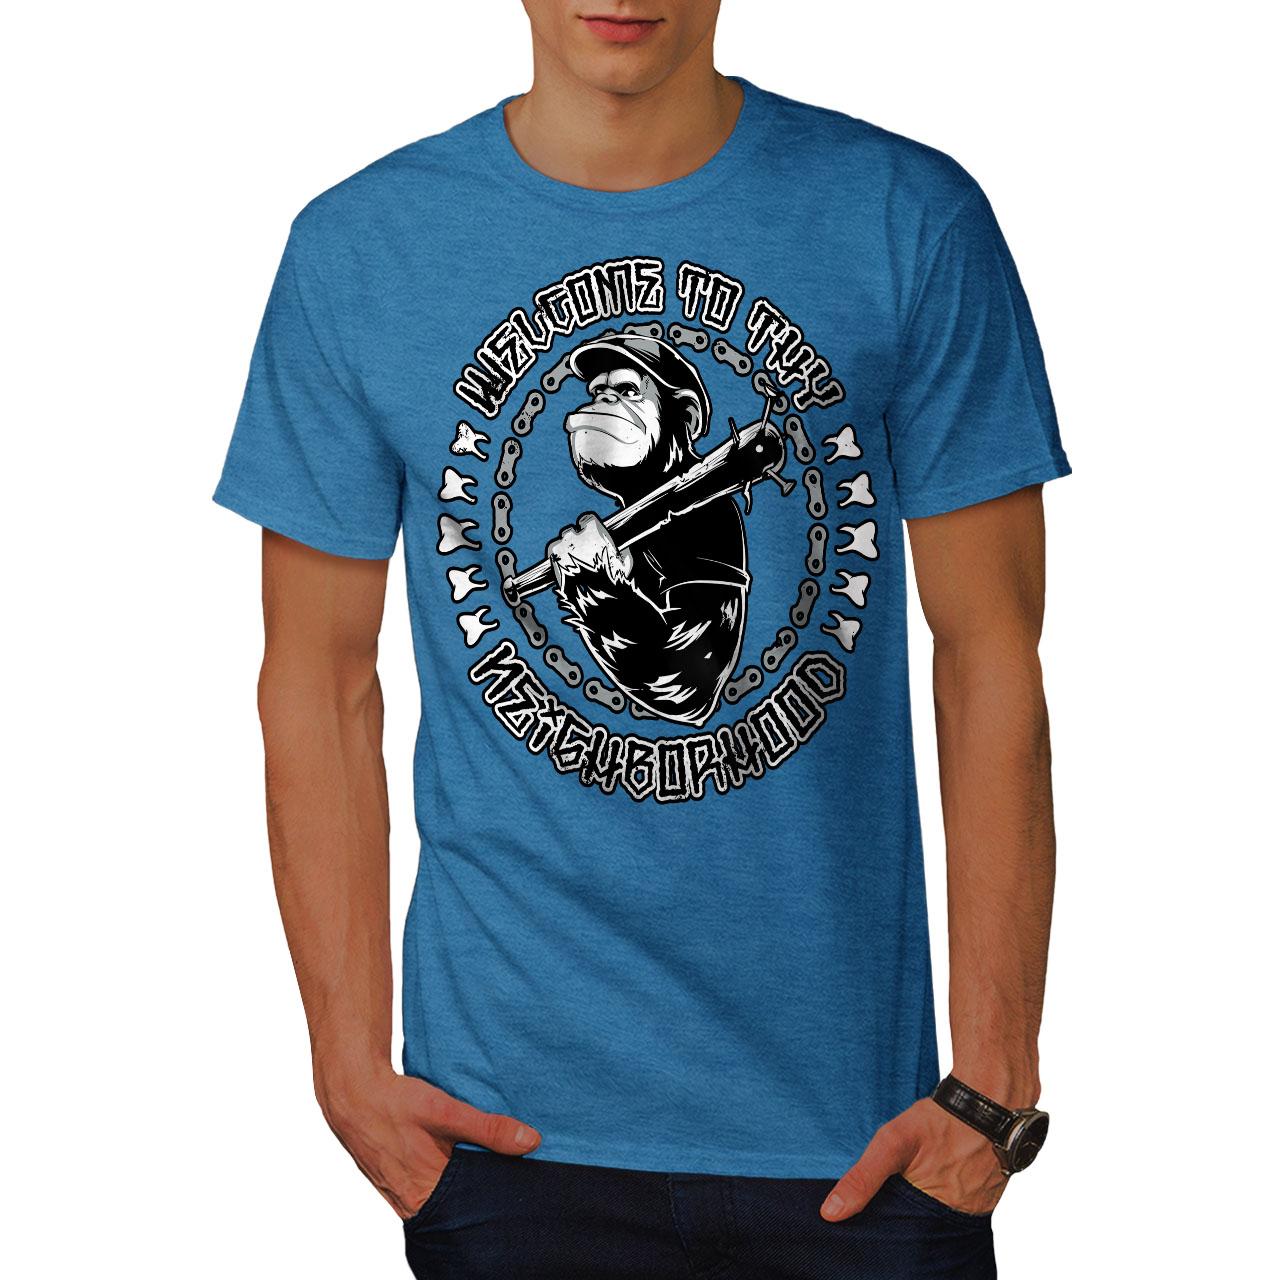 78416abca Wellcoda Welcome Monkey Ape Mens T-shirt, Neighbour Graphic Design ...